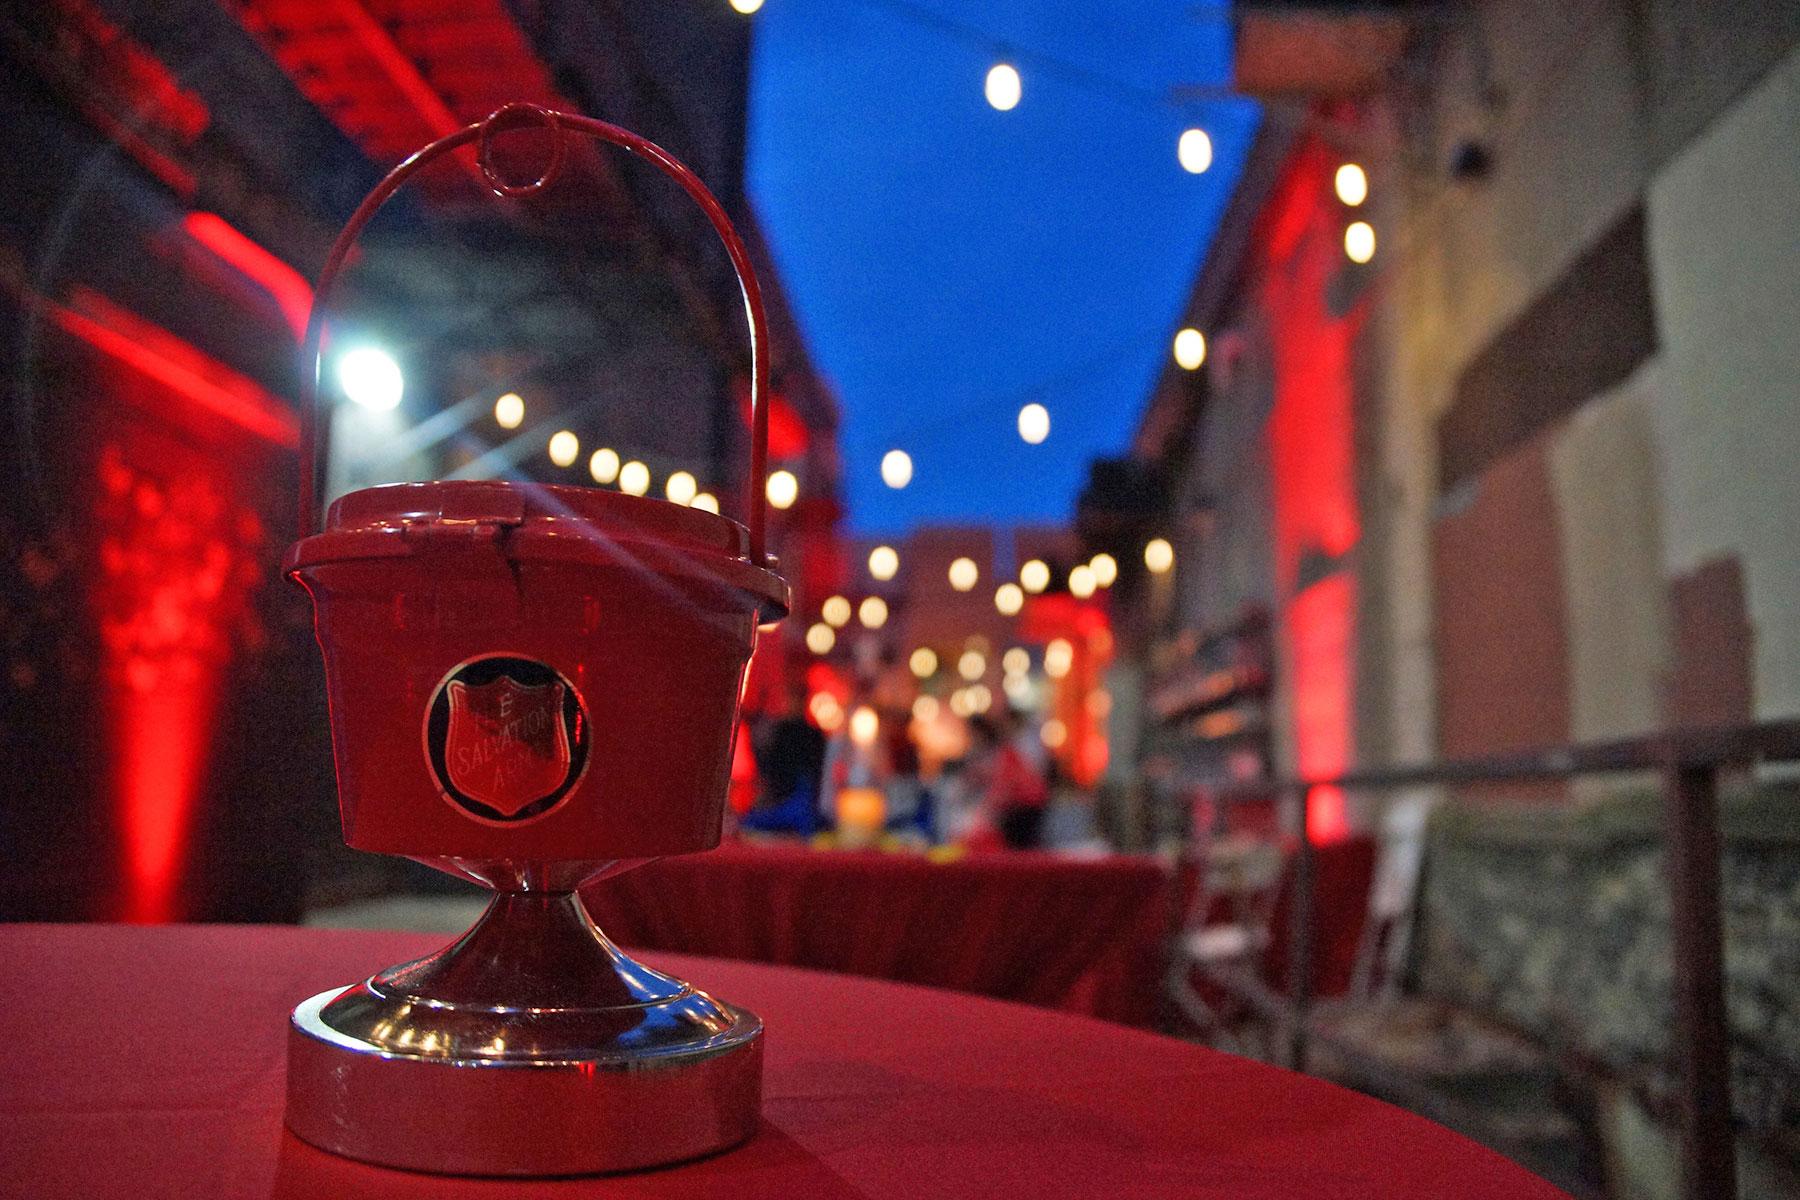 photo essay dinner in black cat alley echelon mke the 082616 jazzalleydinner 0668 082616 jazzalleydinner 0732 082616 jazzalleydinner 1103